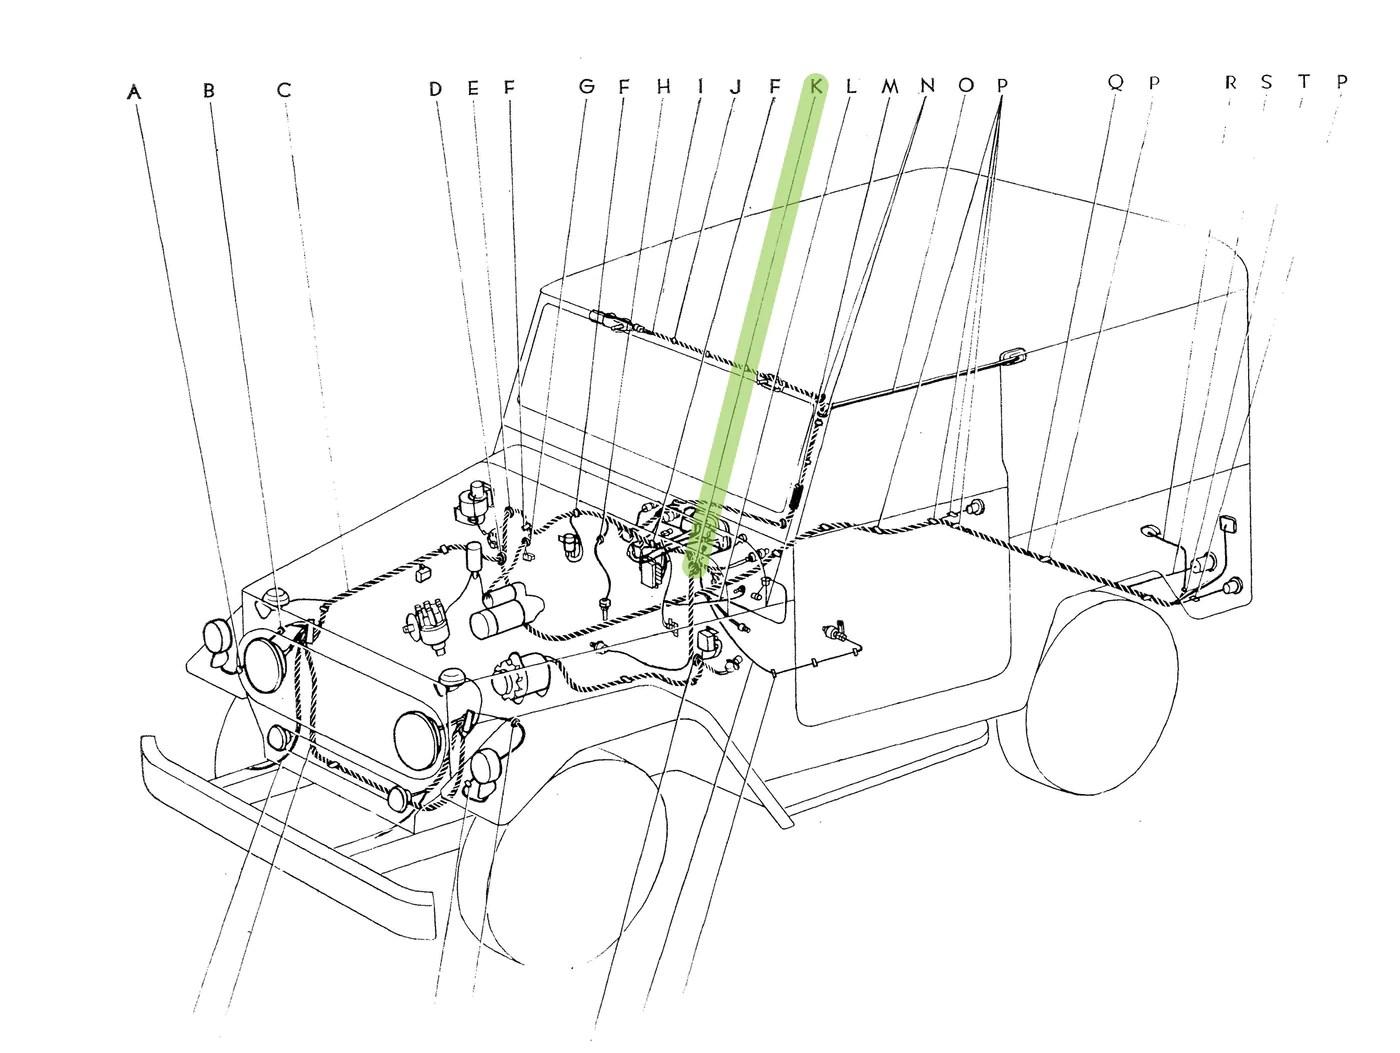 small resolution of wiring diagram grommet key wiring diagram img firewall grommet wire harness oem fj40 fj45